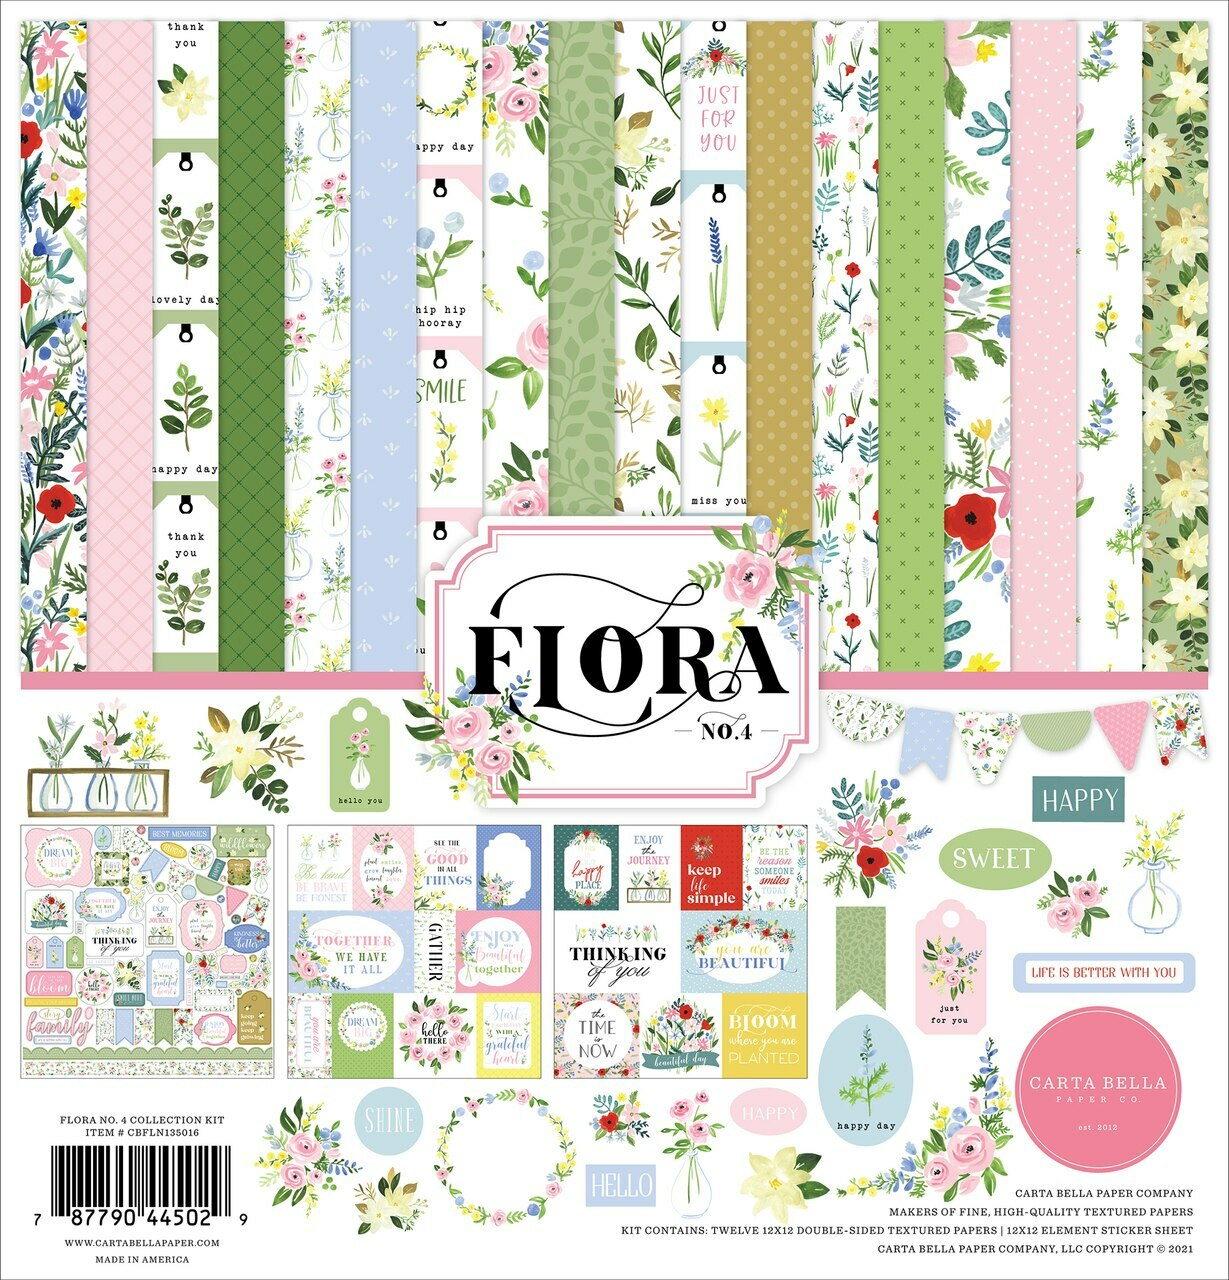 Flora no. 4